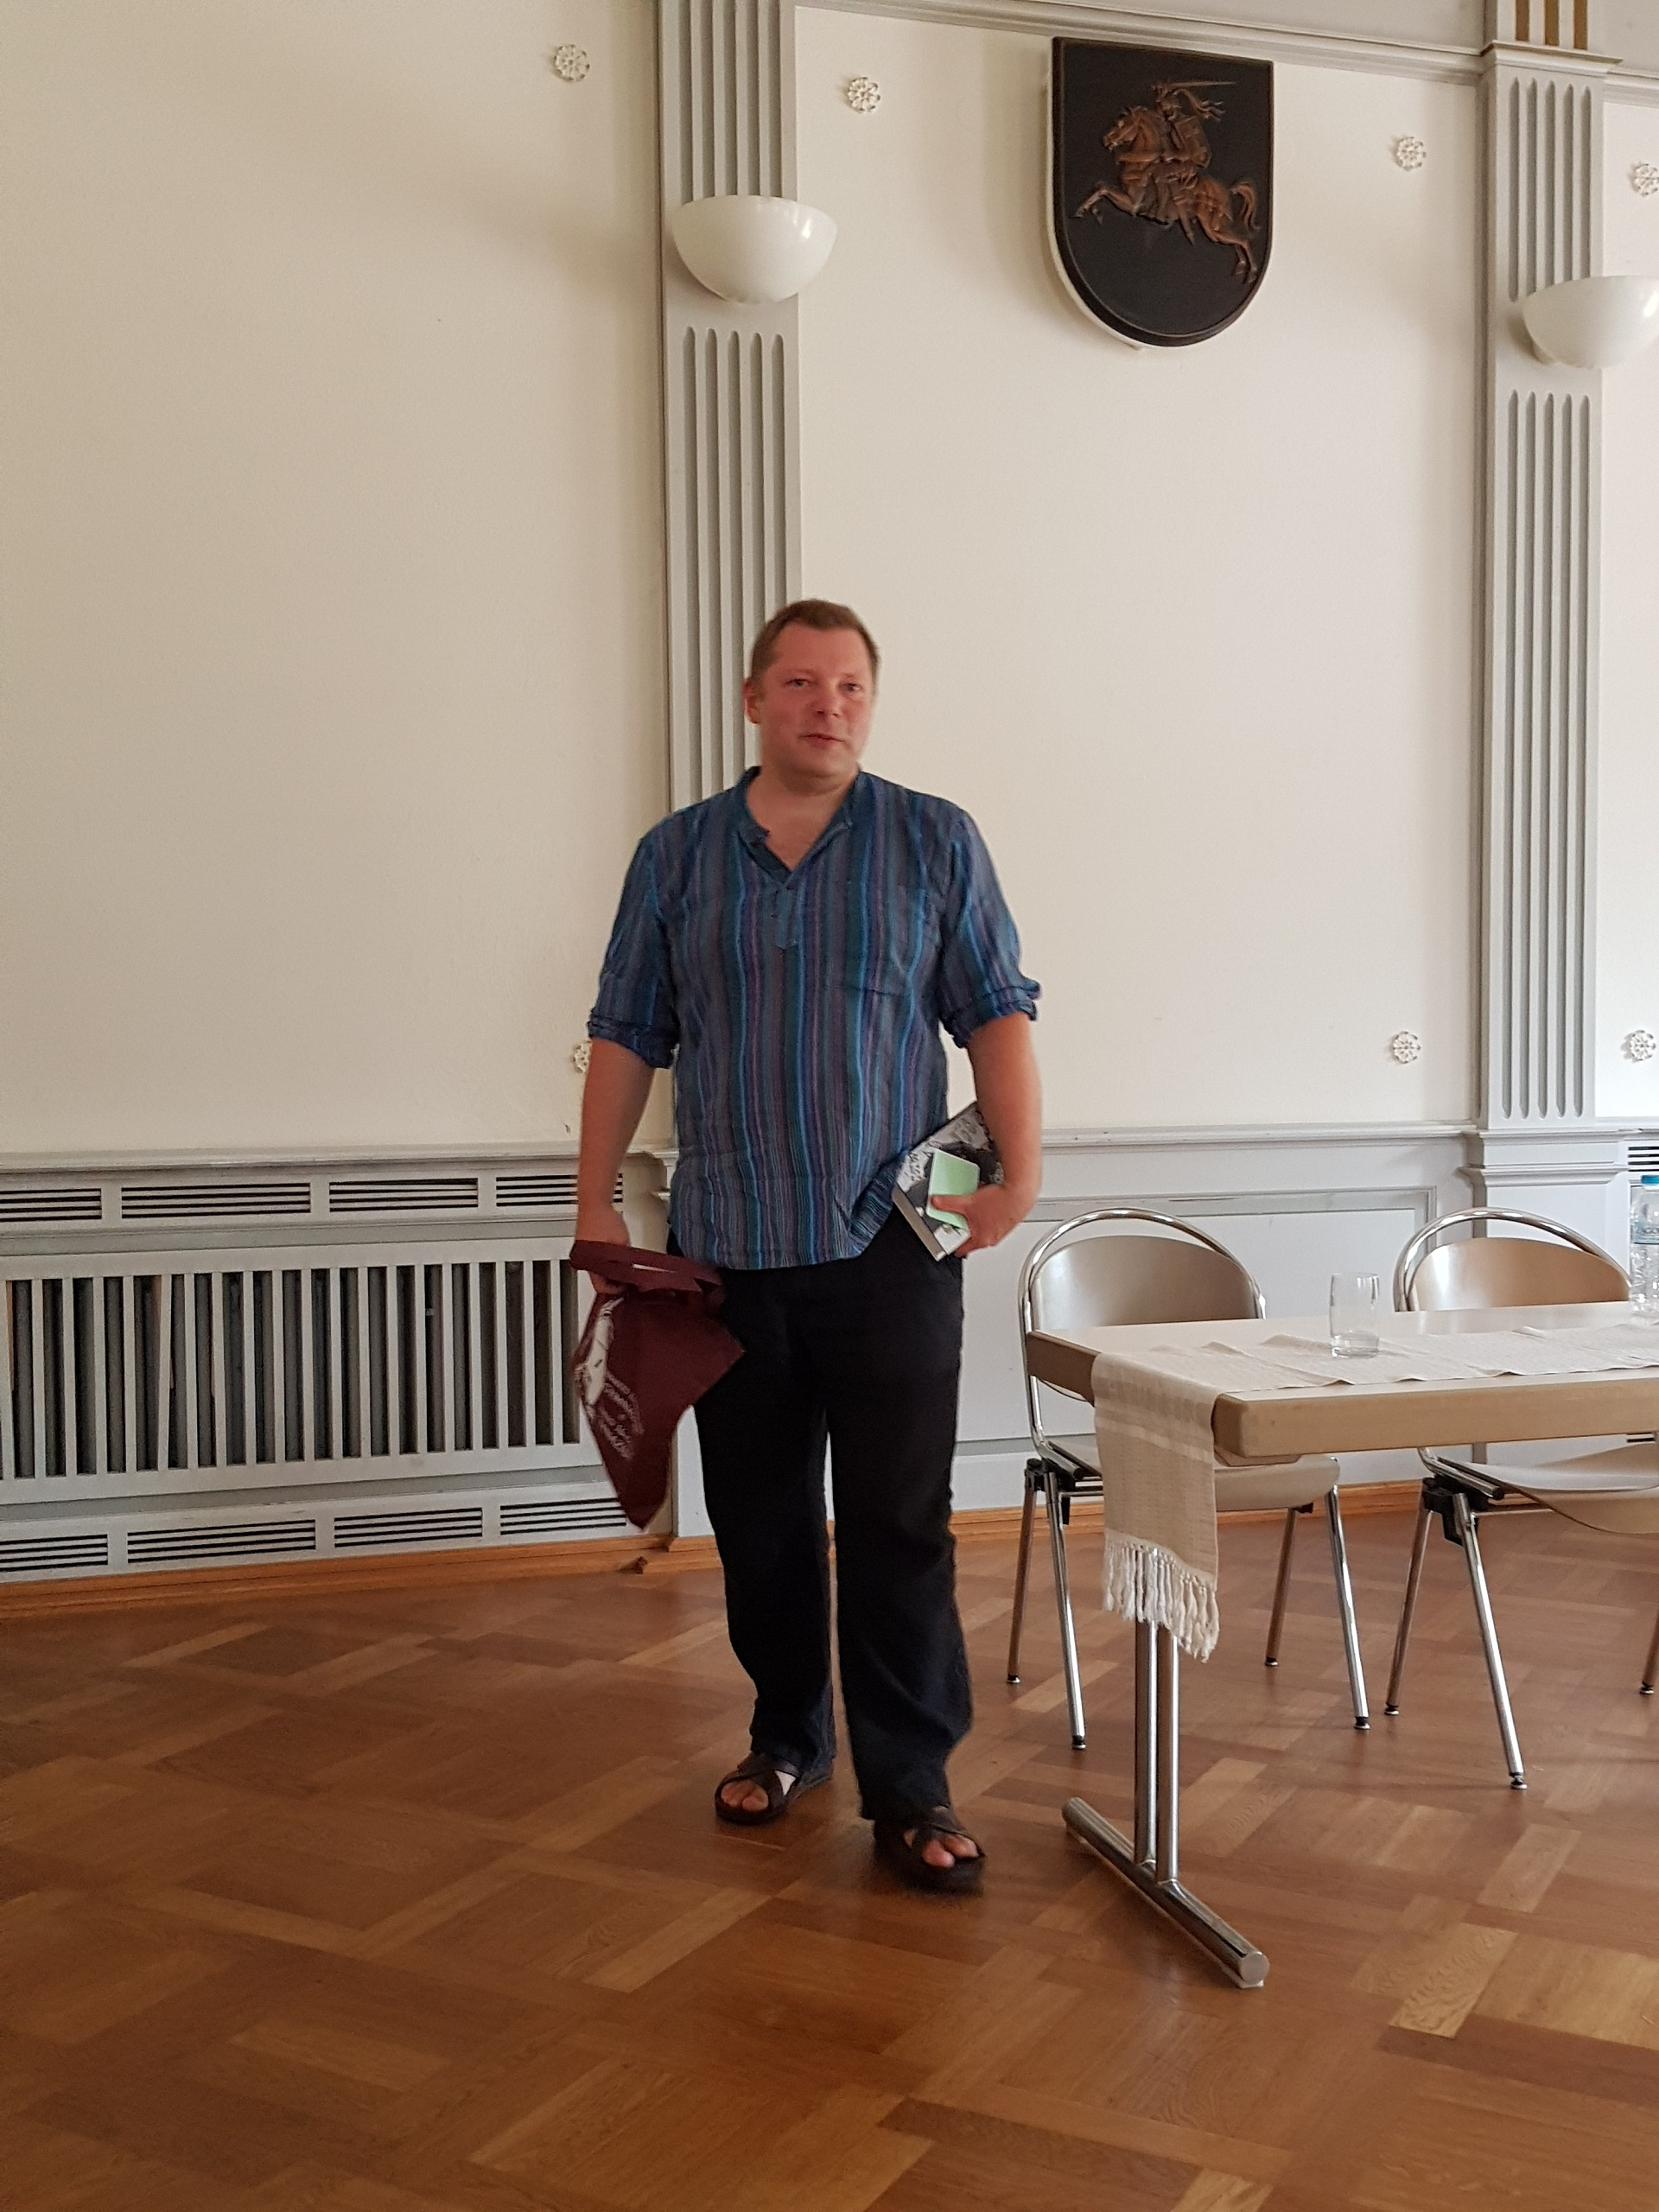 Susitikimas su rašytoju Rimantu Kmita (Foto: A. D'Elia)